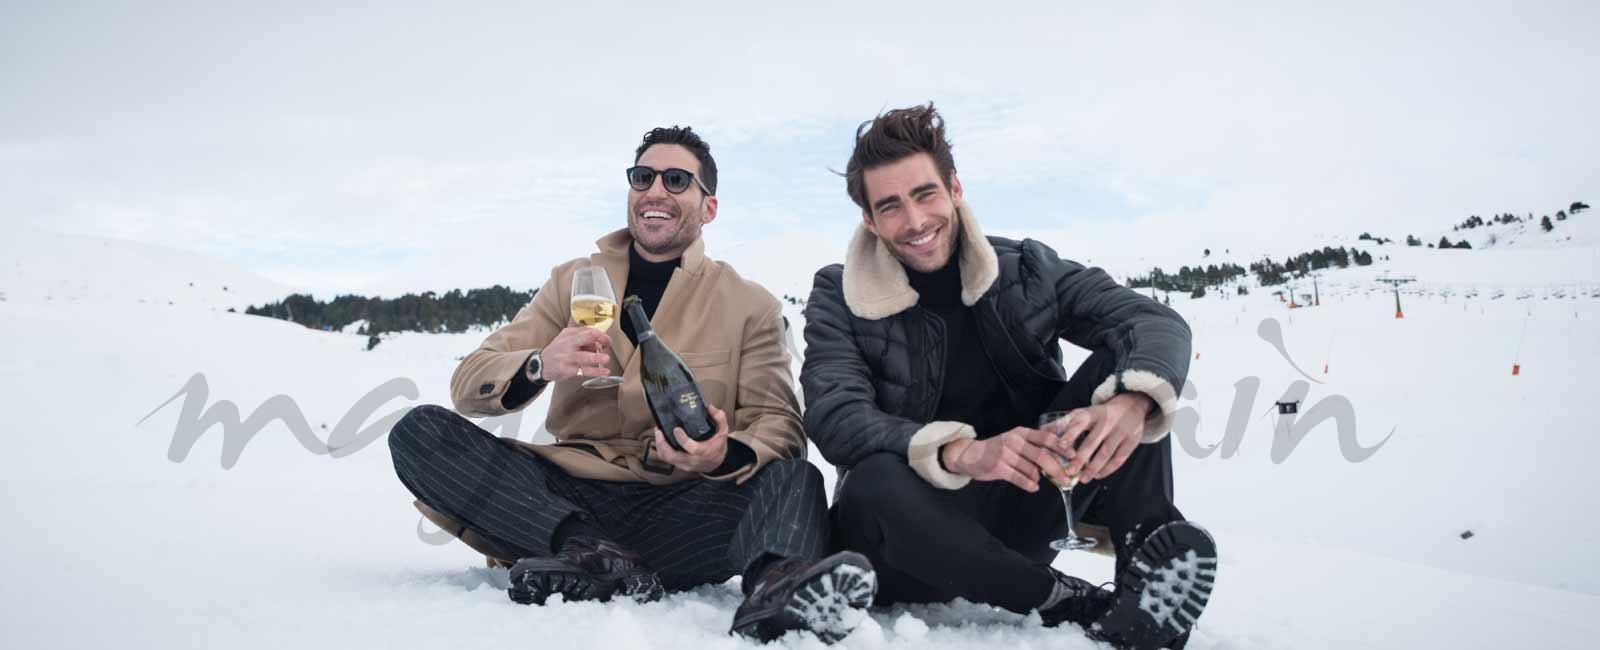 Miguel Ángel Silvestre y Jon Kortajarena se divierten en la nieve